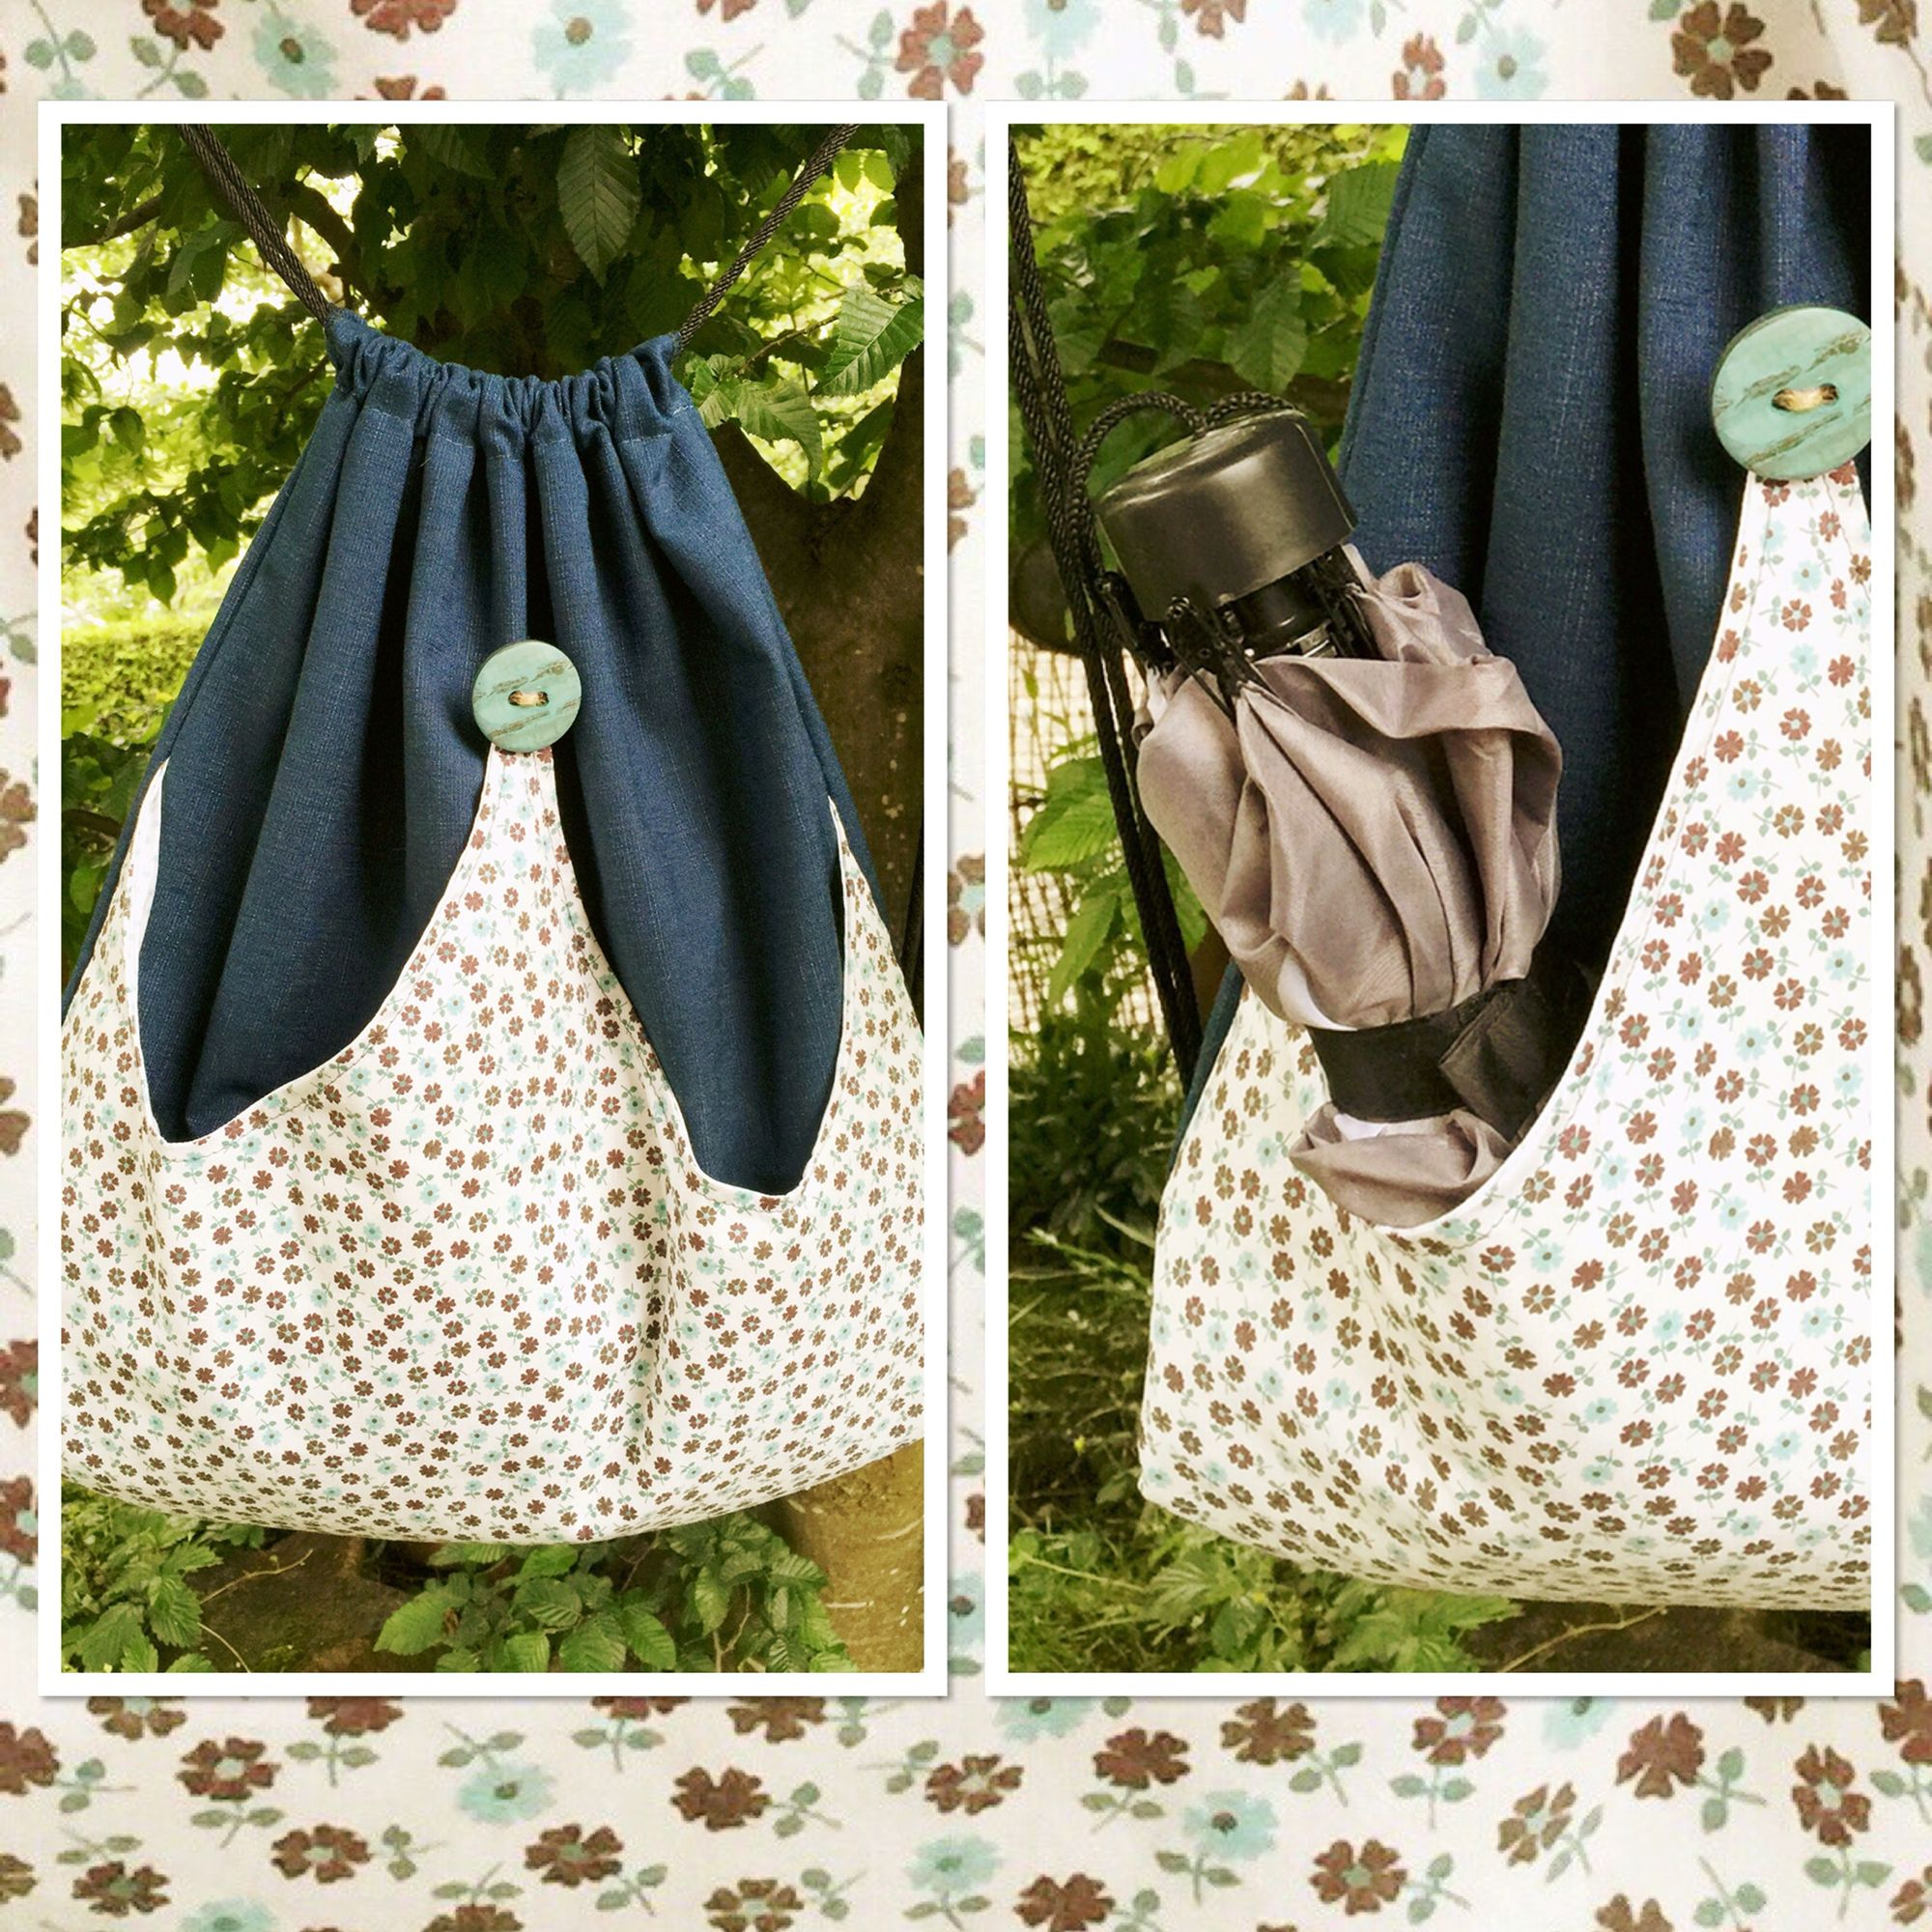 Neue Idee, neues Design | Karus - Handmade bags and more | Pinterest